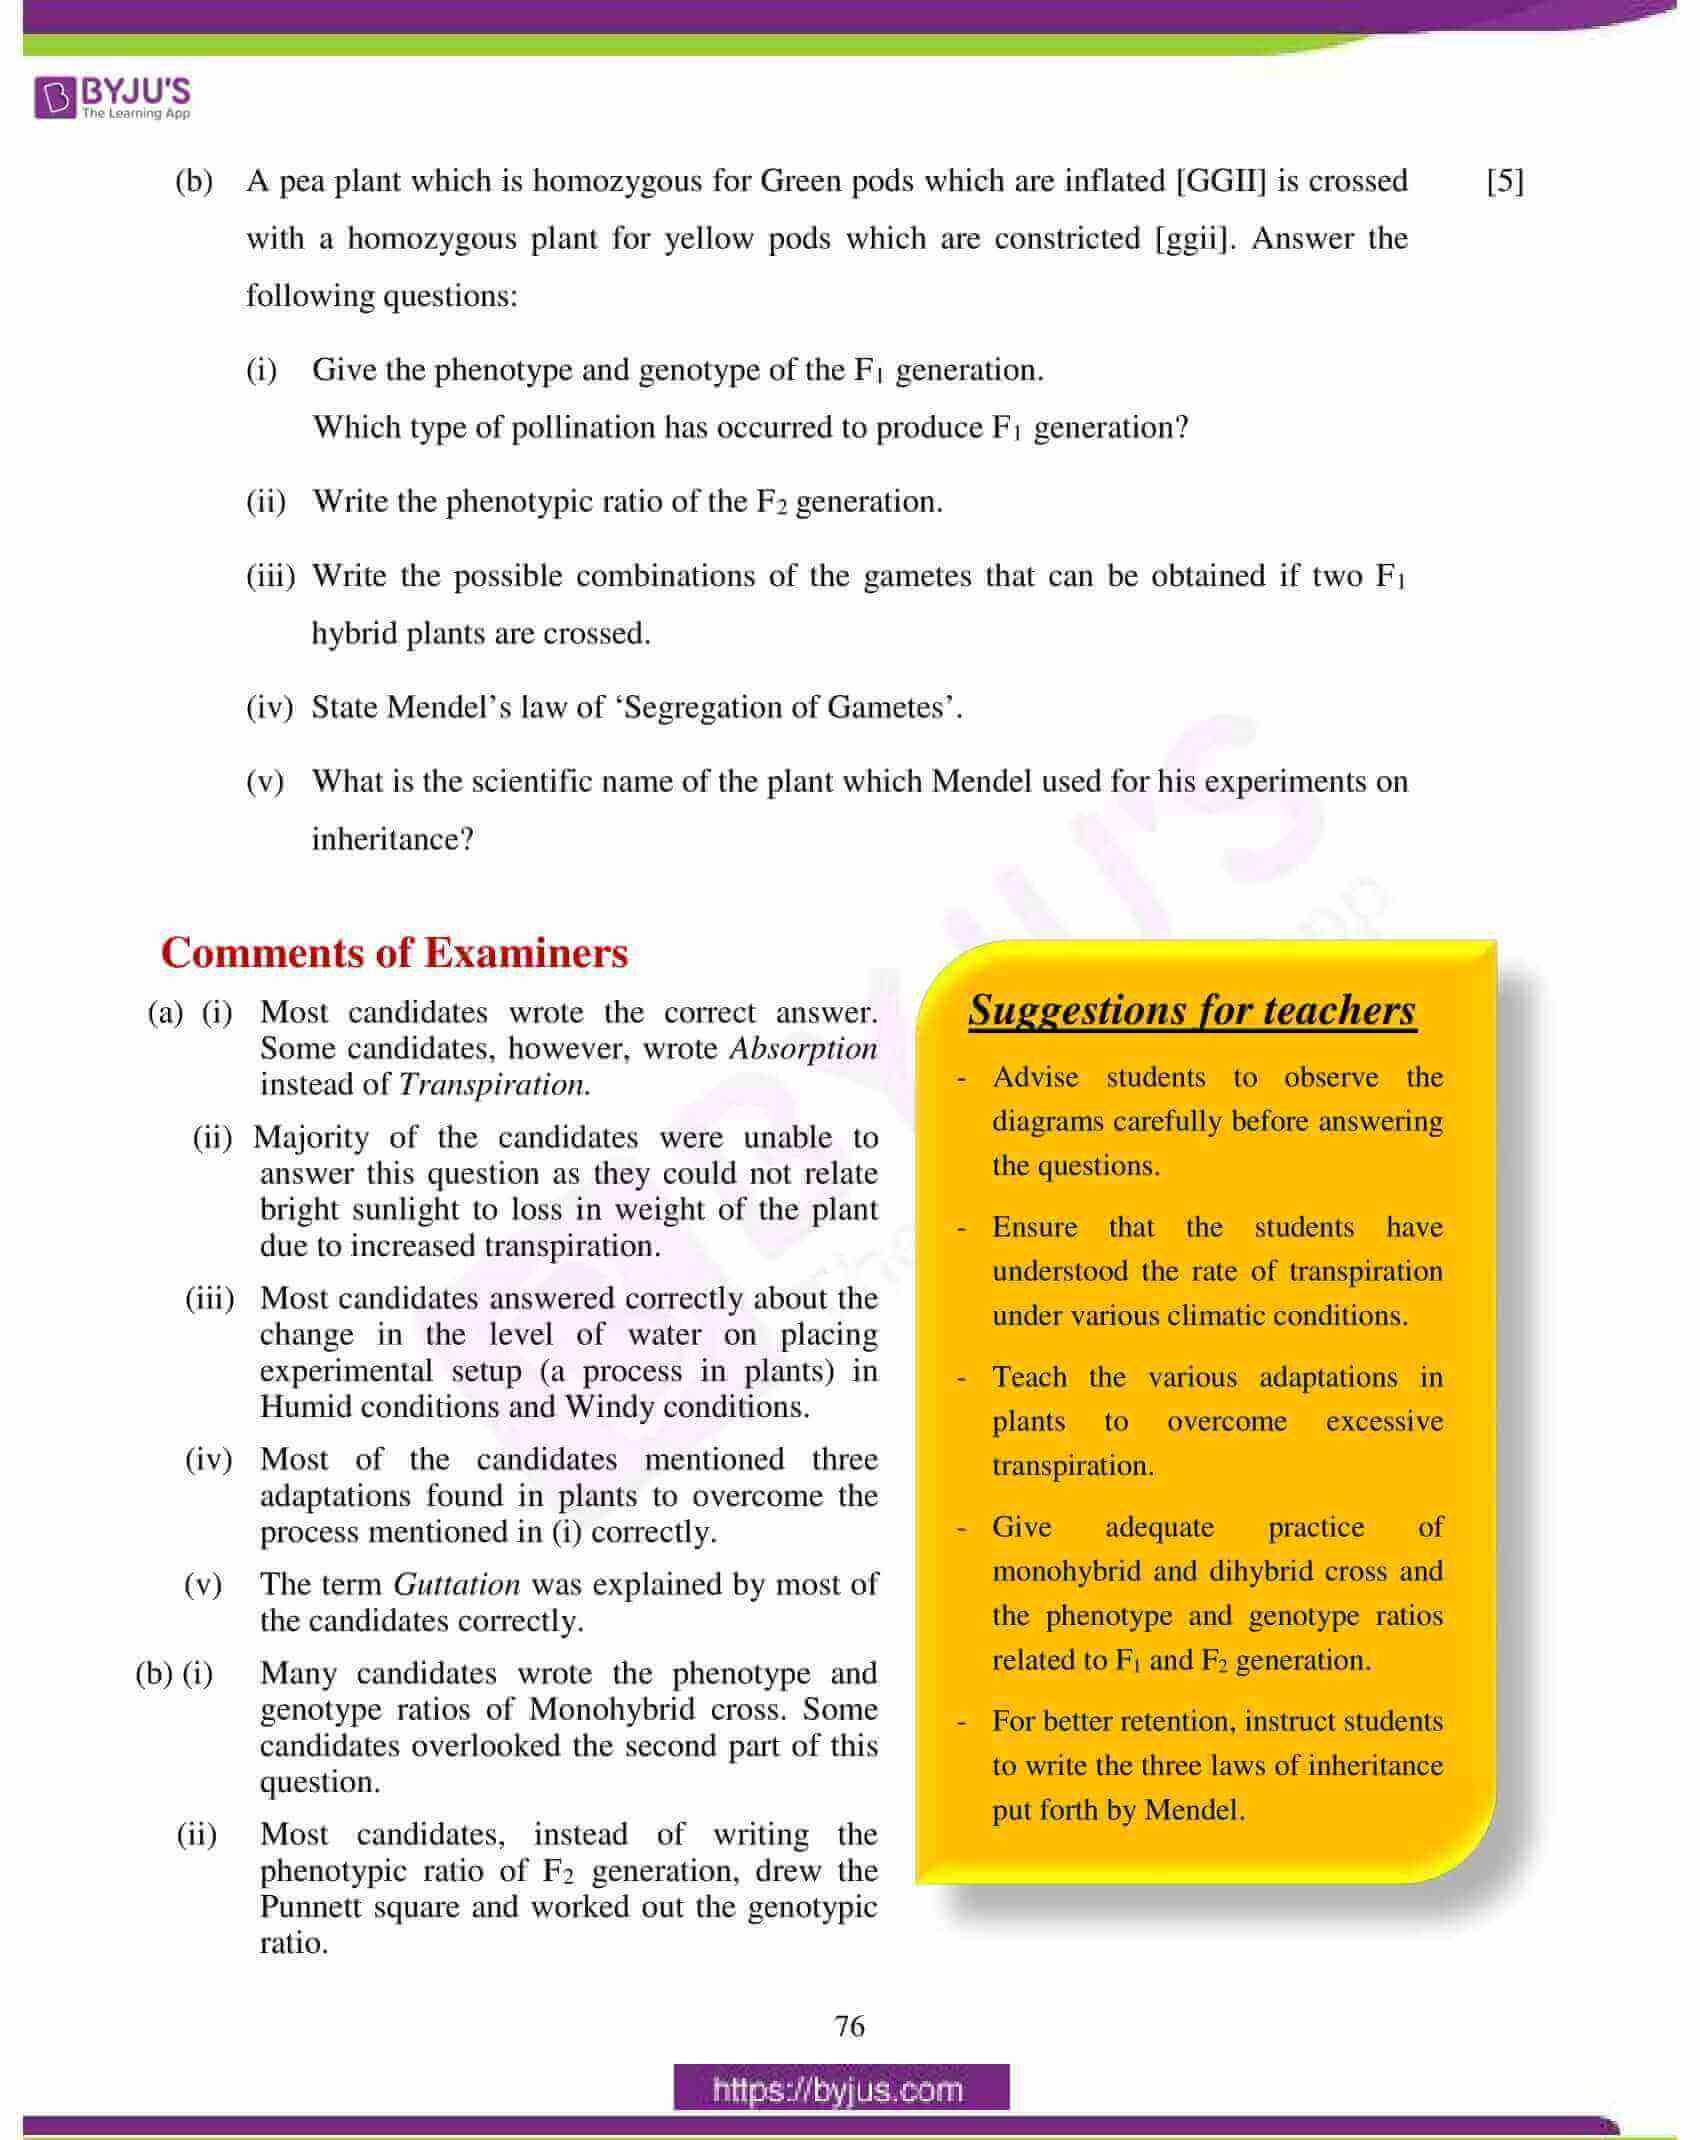 icse class 10 biology question paper solution 2018 23